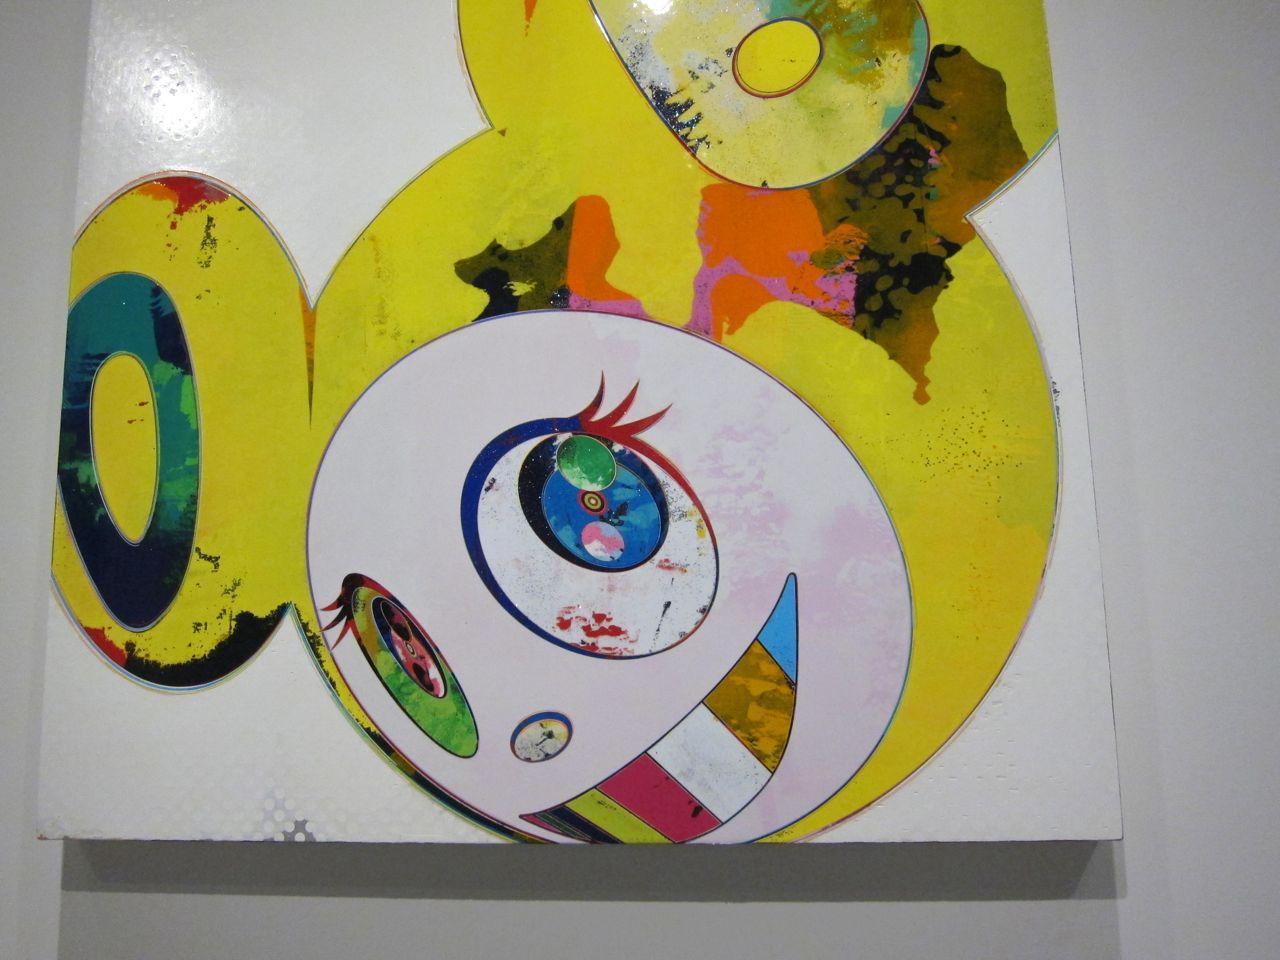 Murkami New Day Christies japan auction AM 31